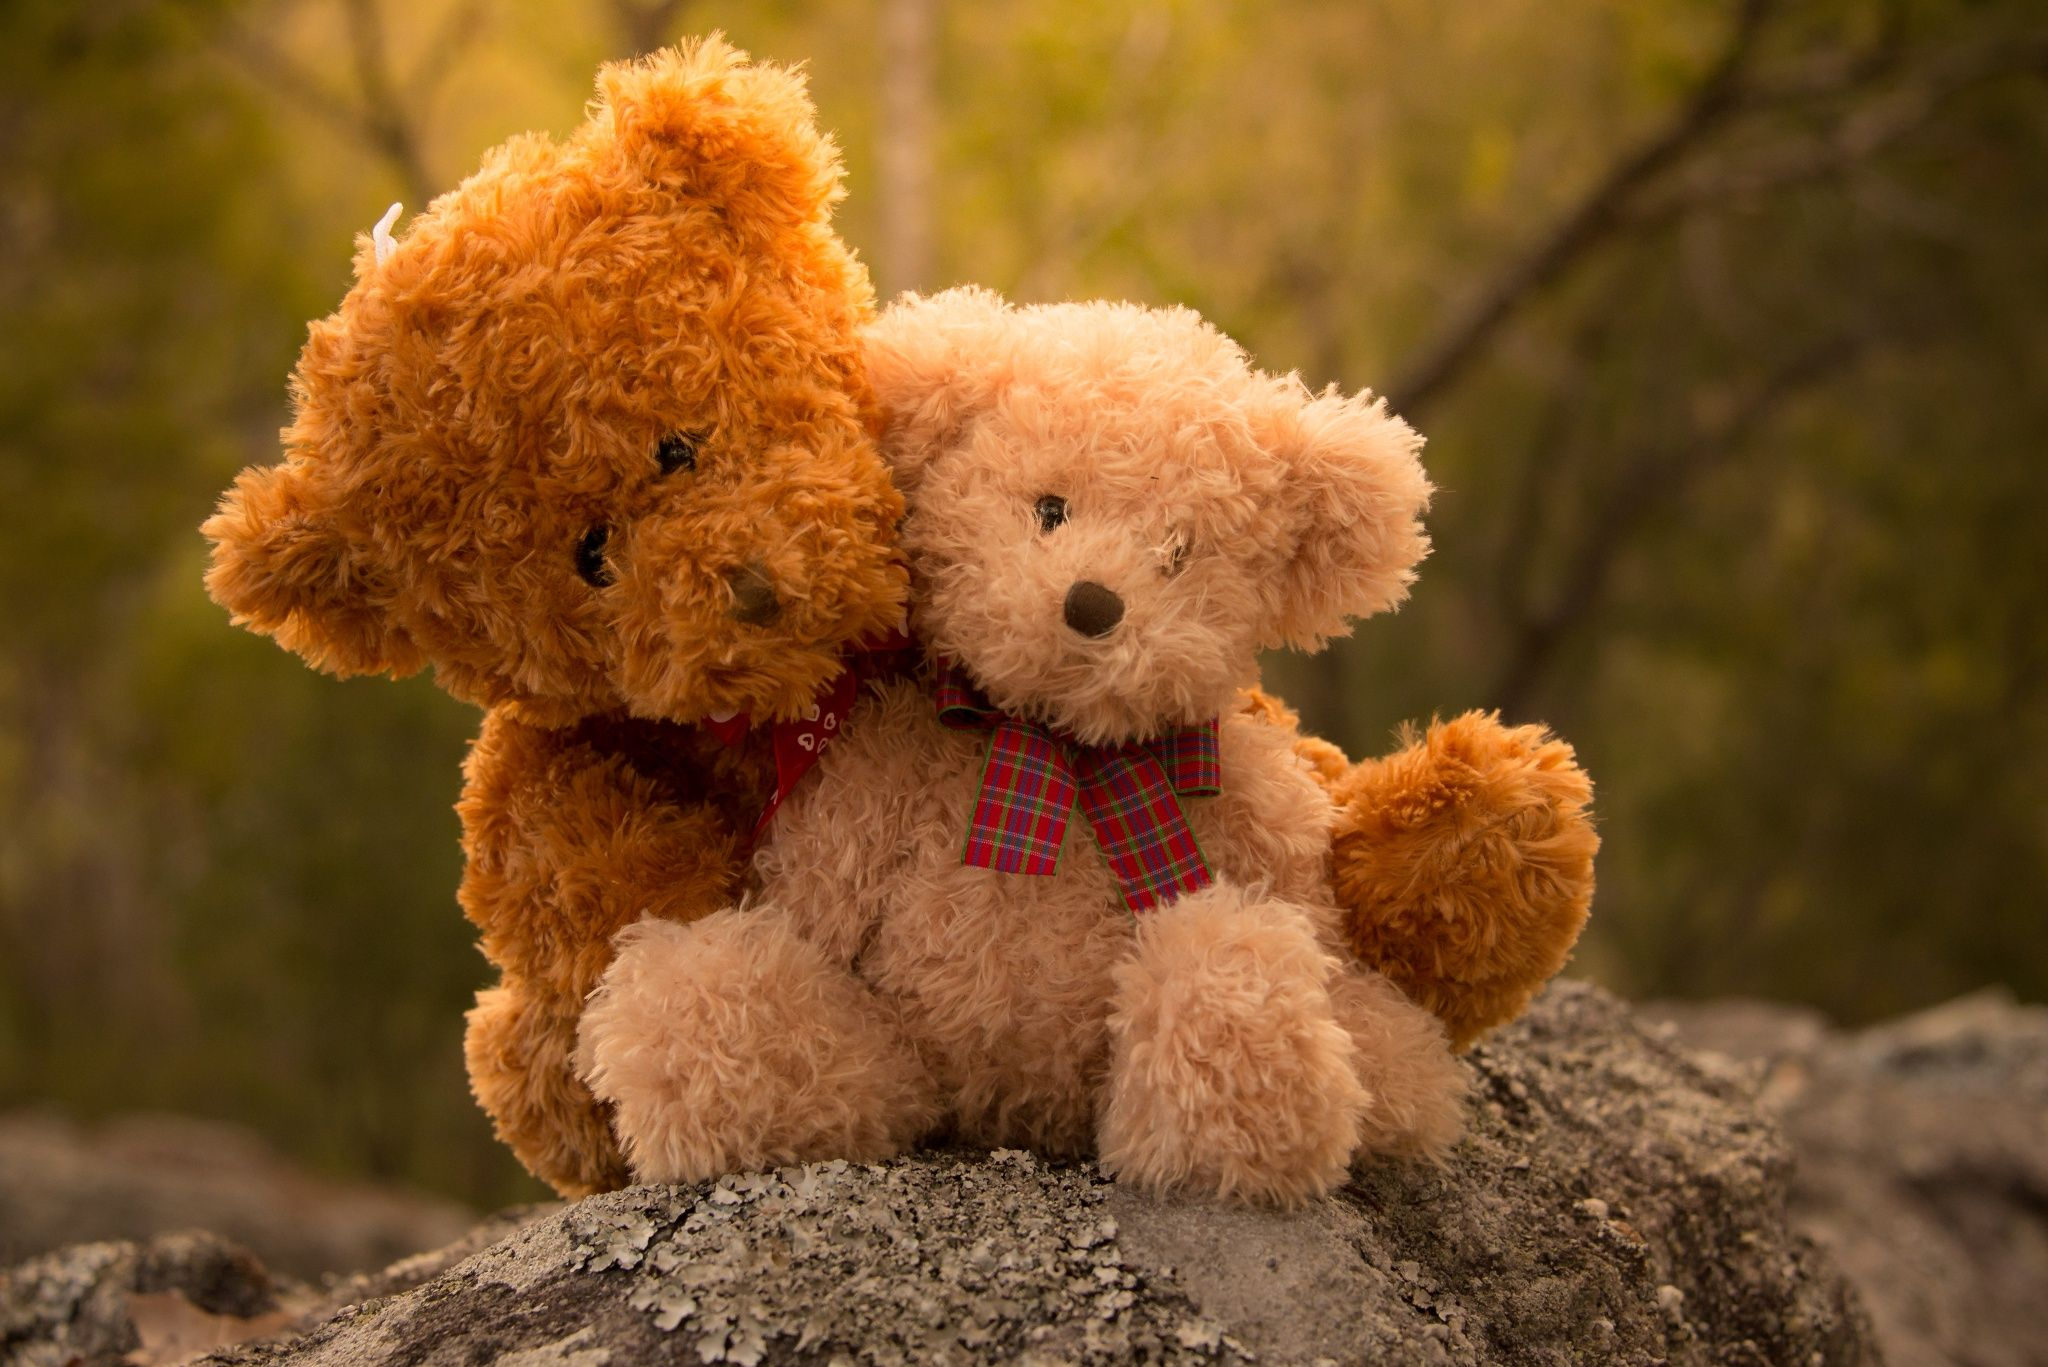 Pin By Gaby On Teddy Als Globetrotter Und Andere Geschichten Teddy Bear Wallpaper Teddy Bear Pictures Teddy Bear